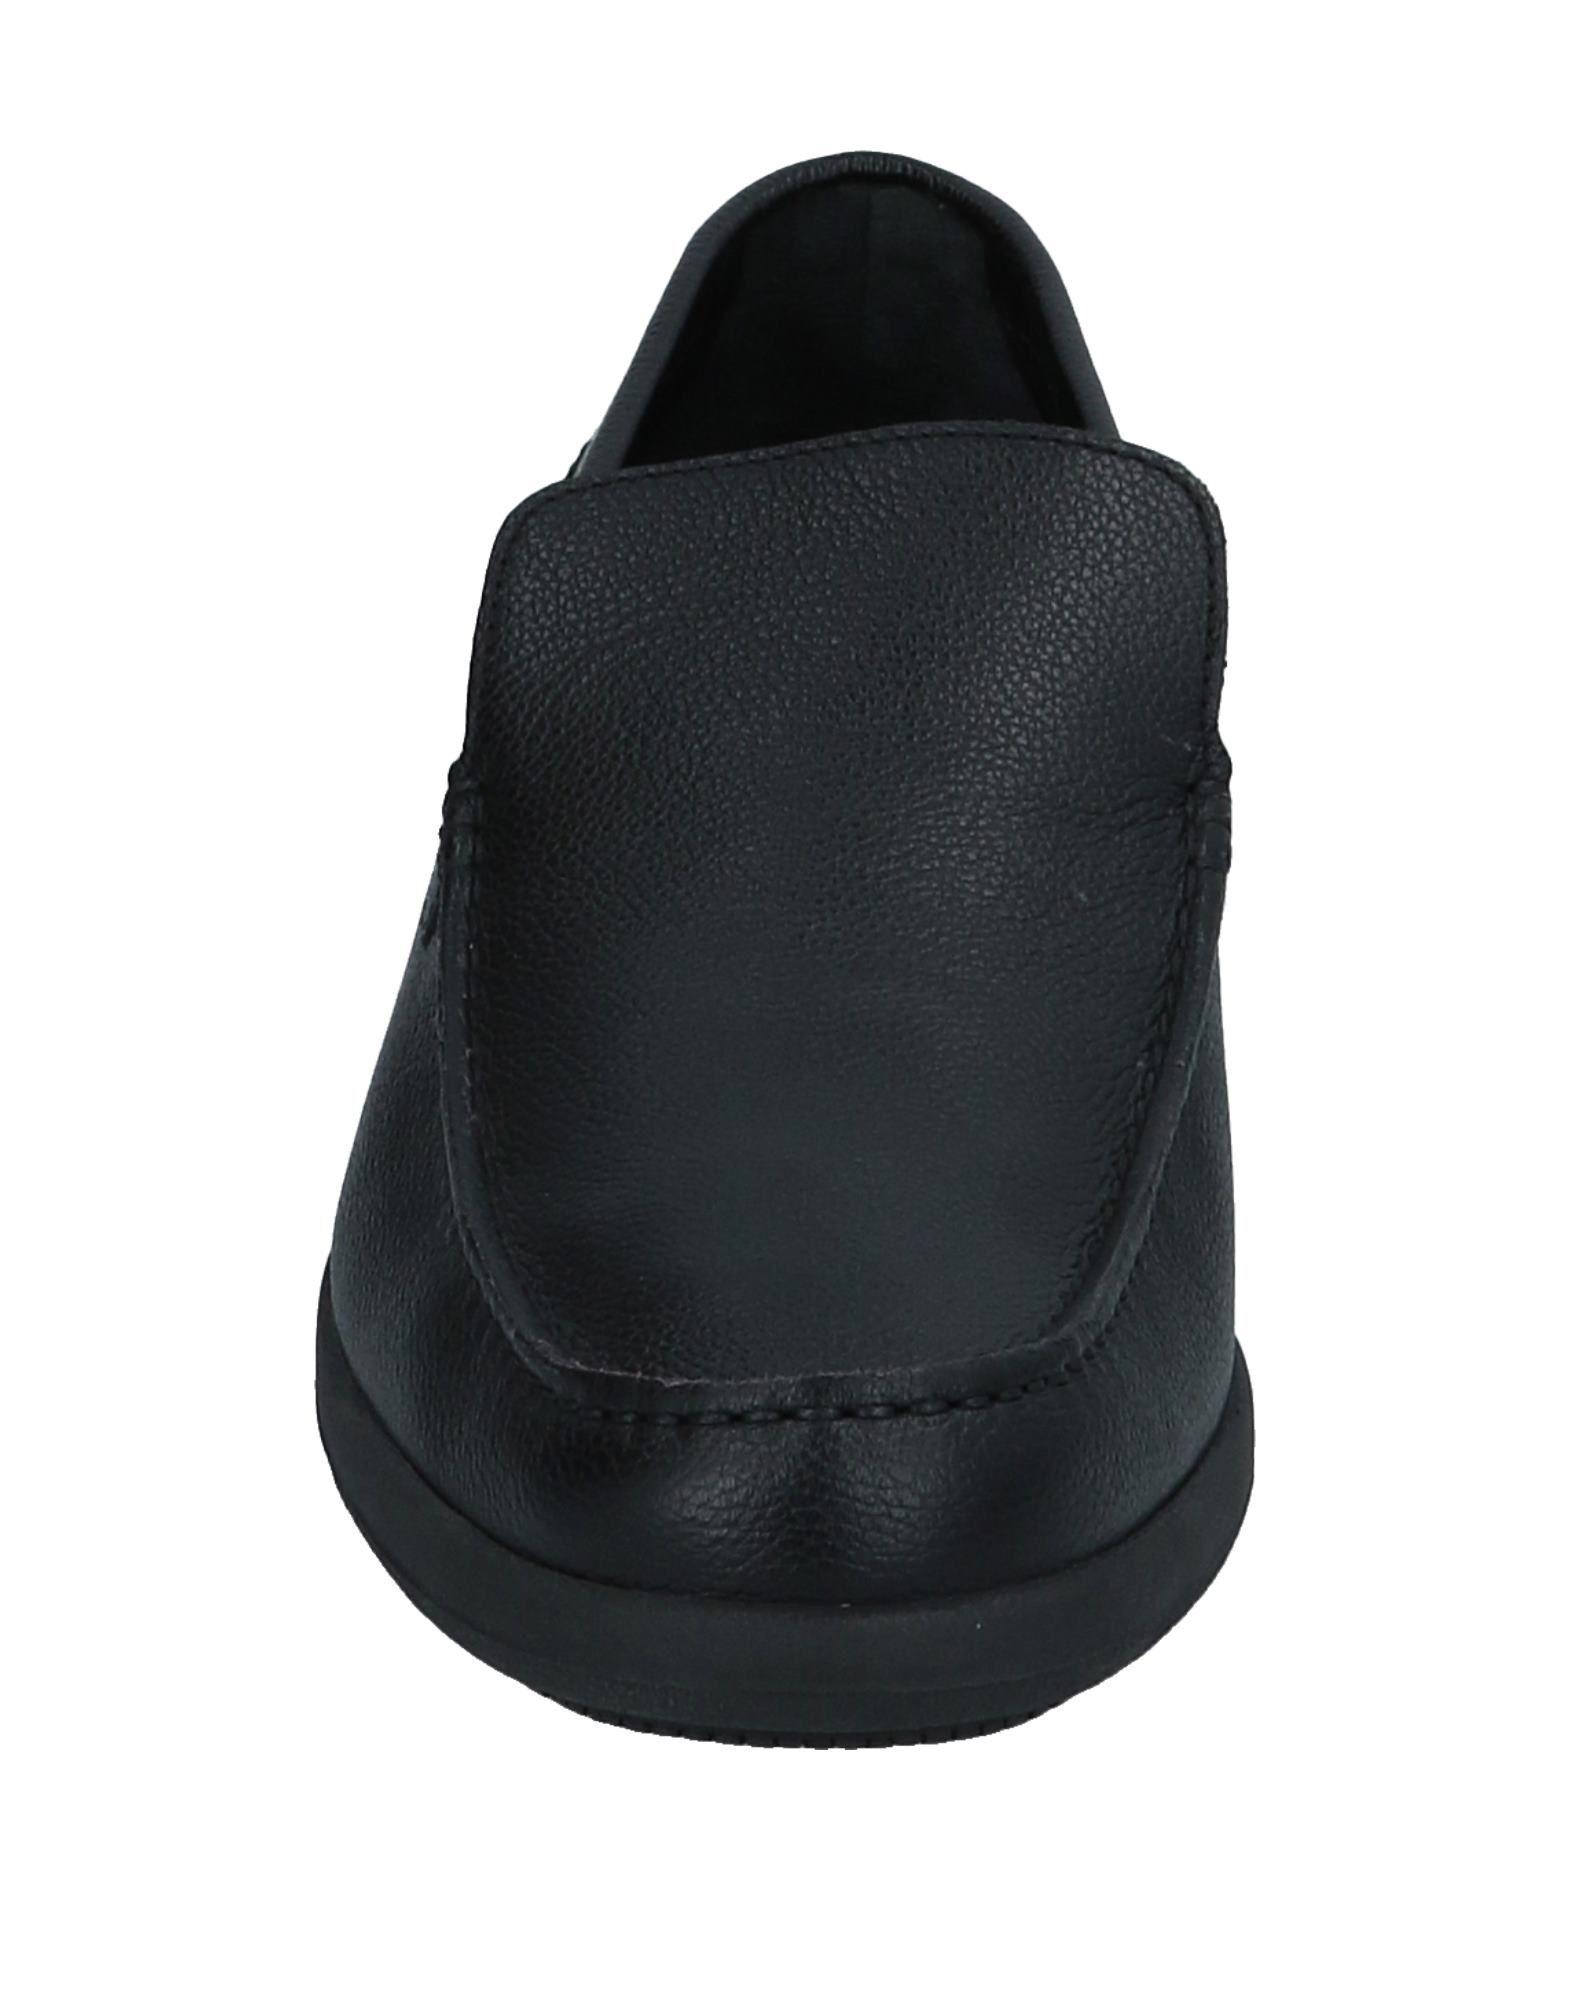 A.Testoni Loafers - Men A.Testoni Loafers online on on on  Australia - 11542471OF 177b14